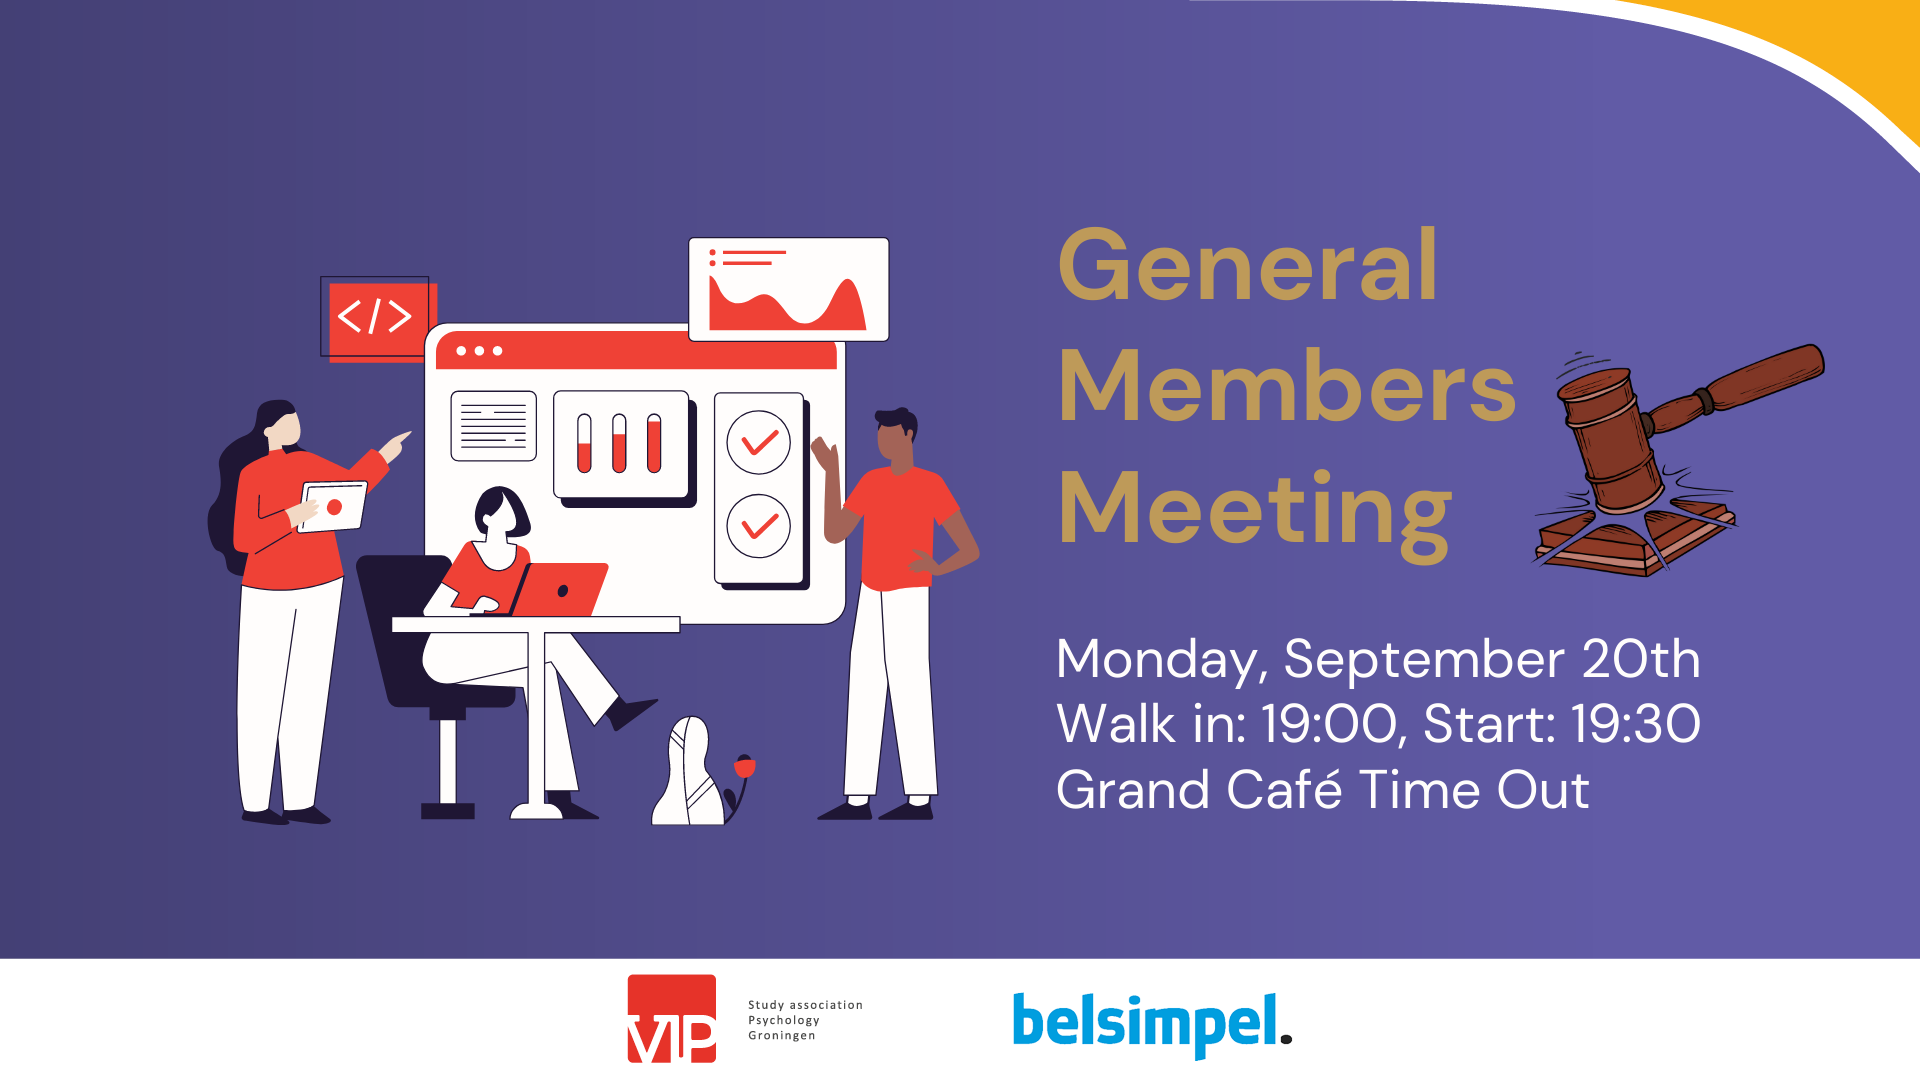 VIP: General Members Meeting